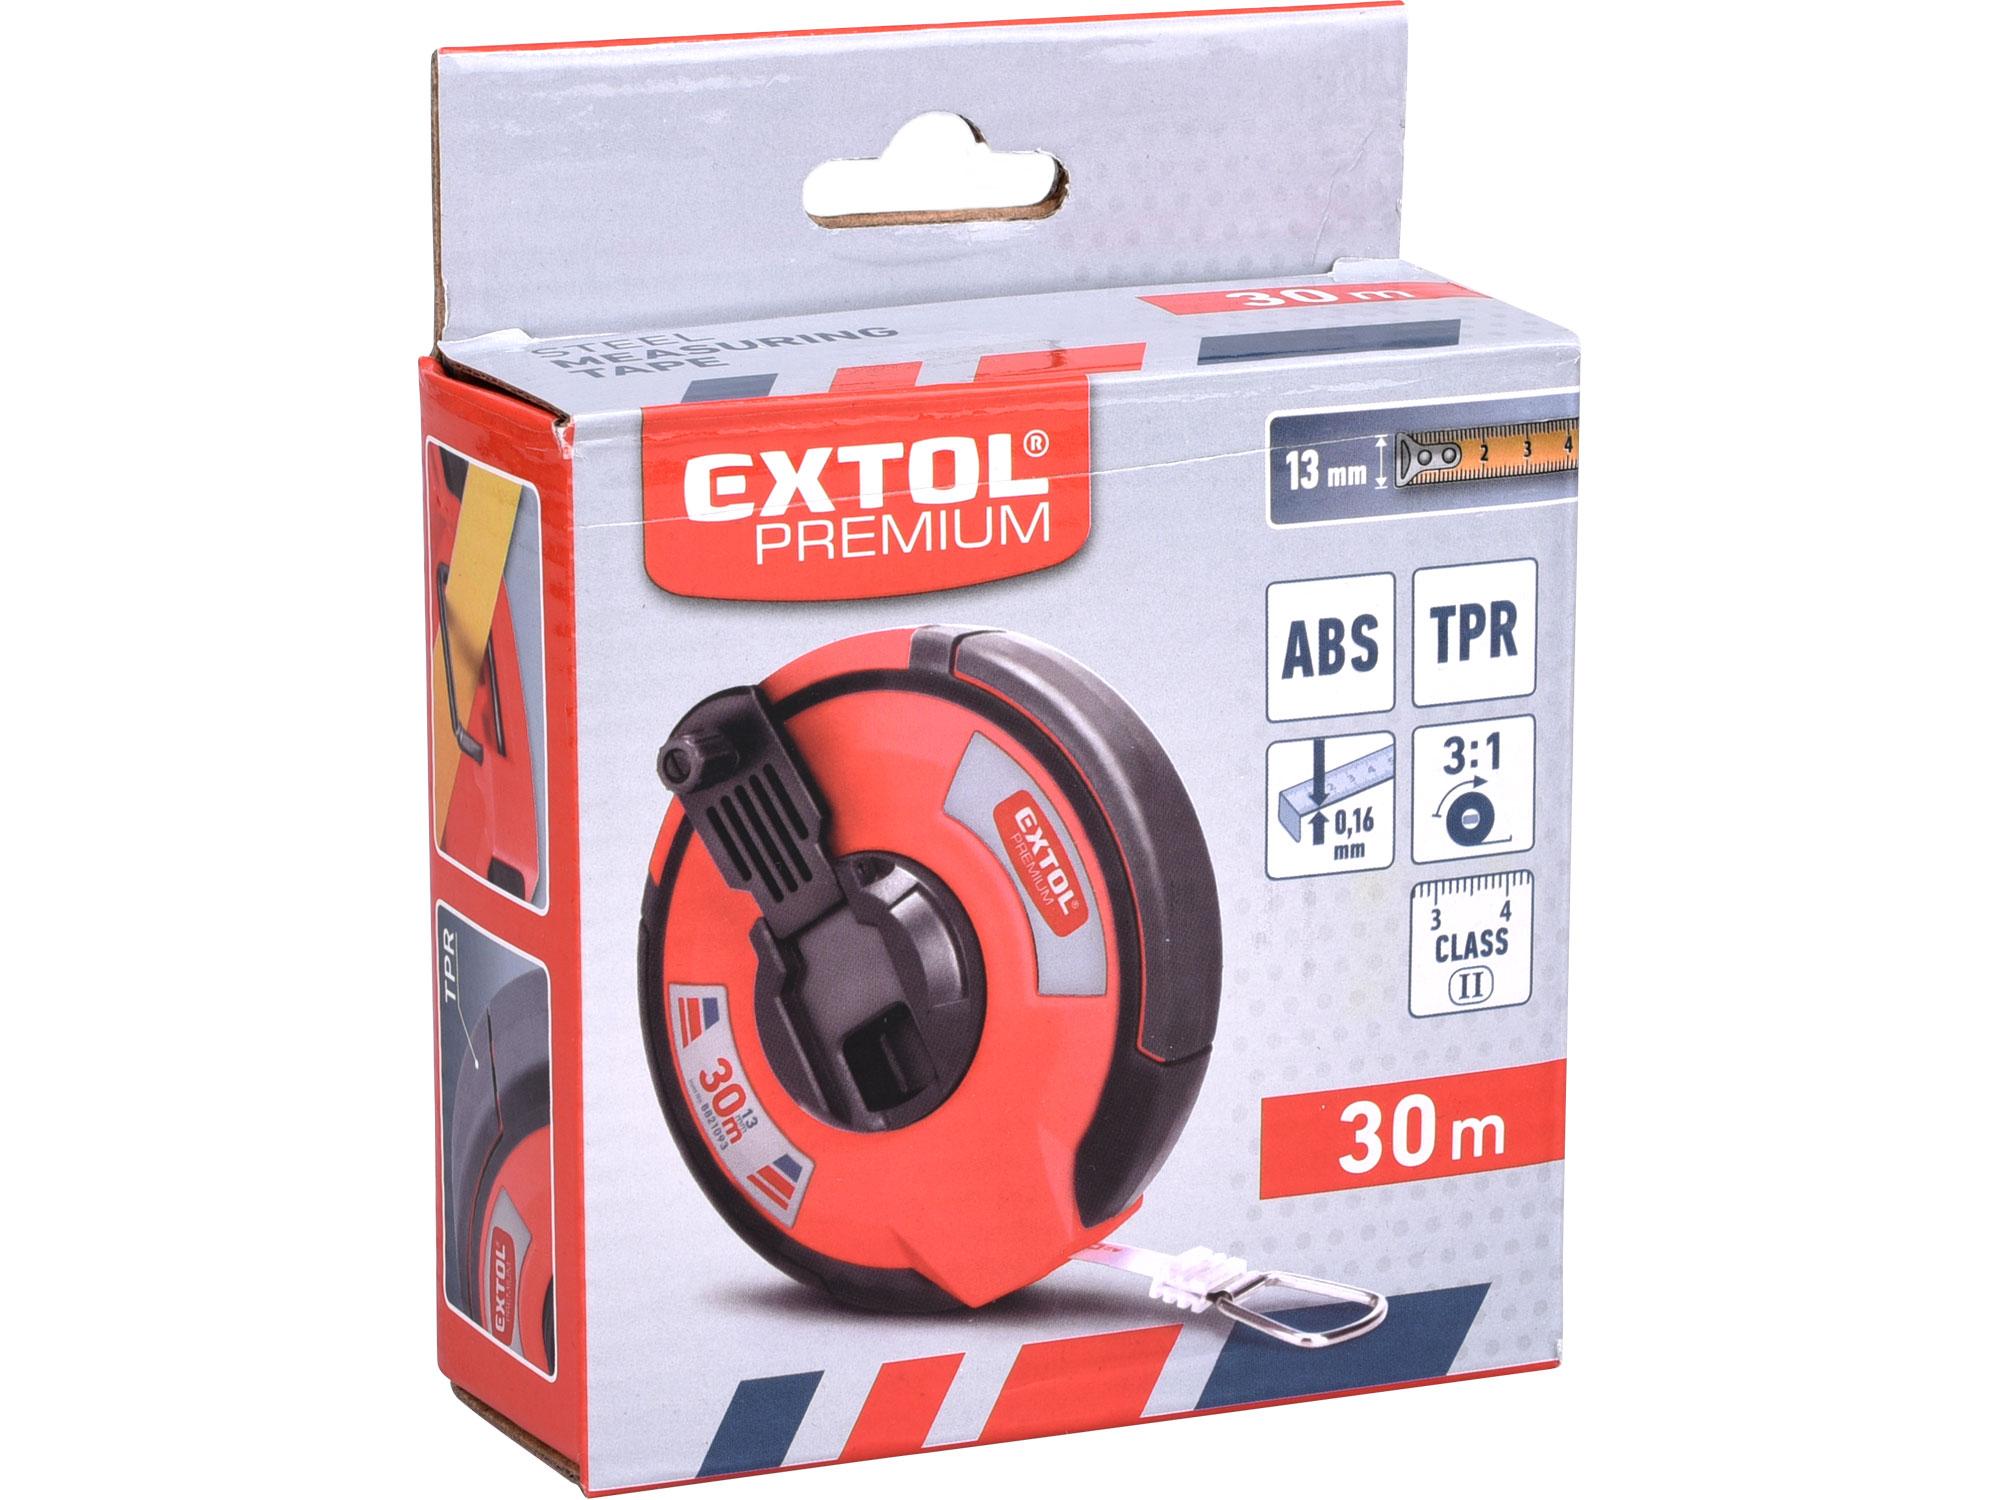 Pásmo ocelové, 30m,š. pásku 13mm EXTOL PREMIUM 8821093